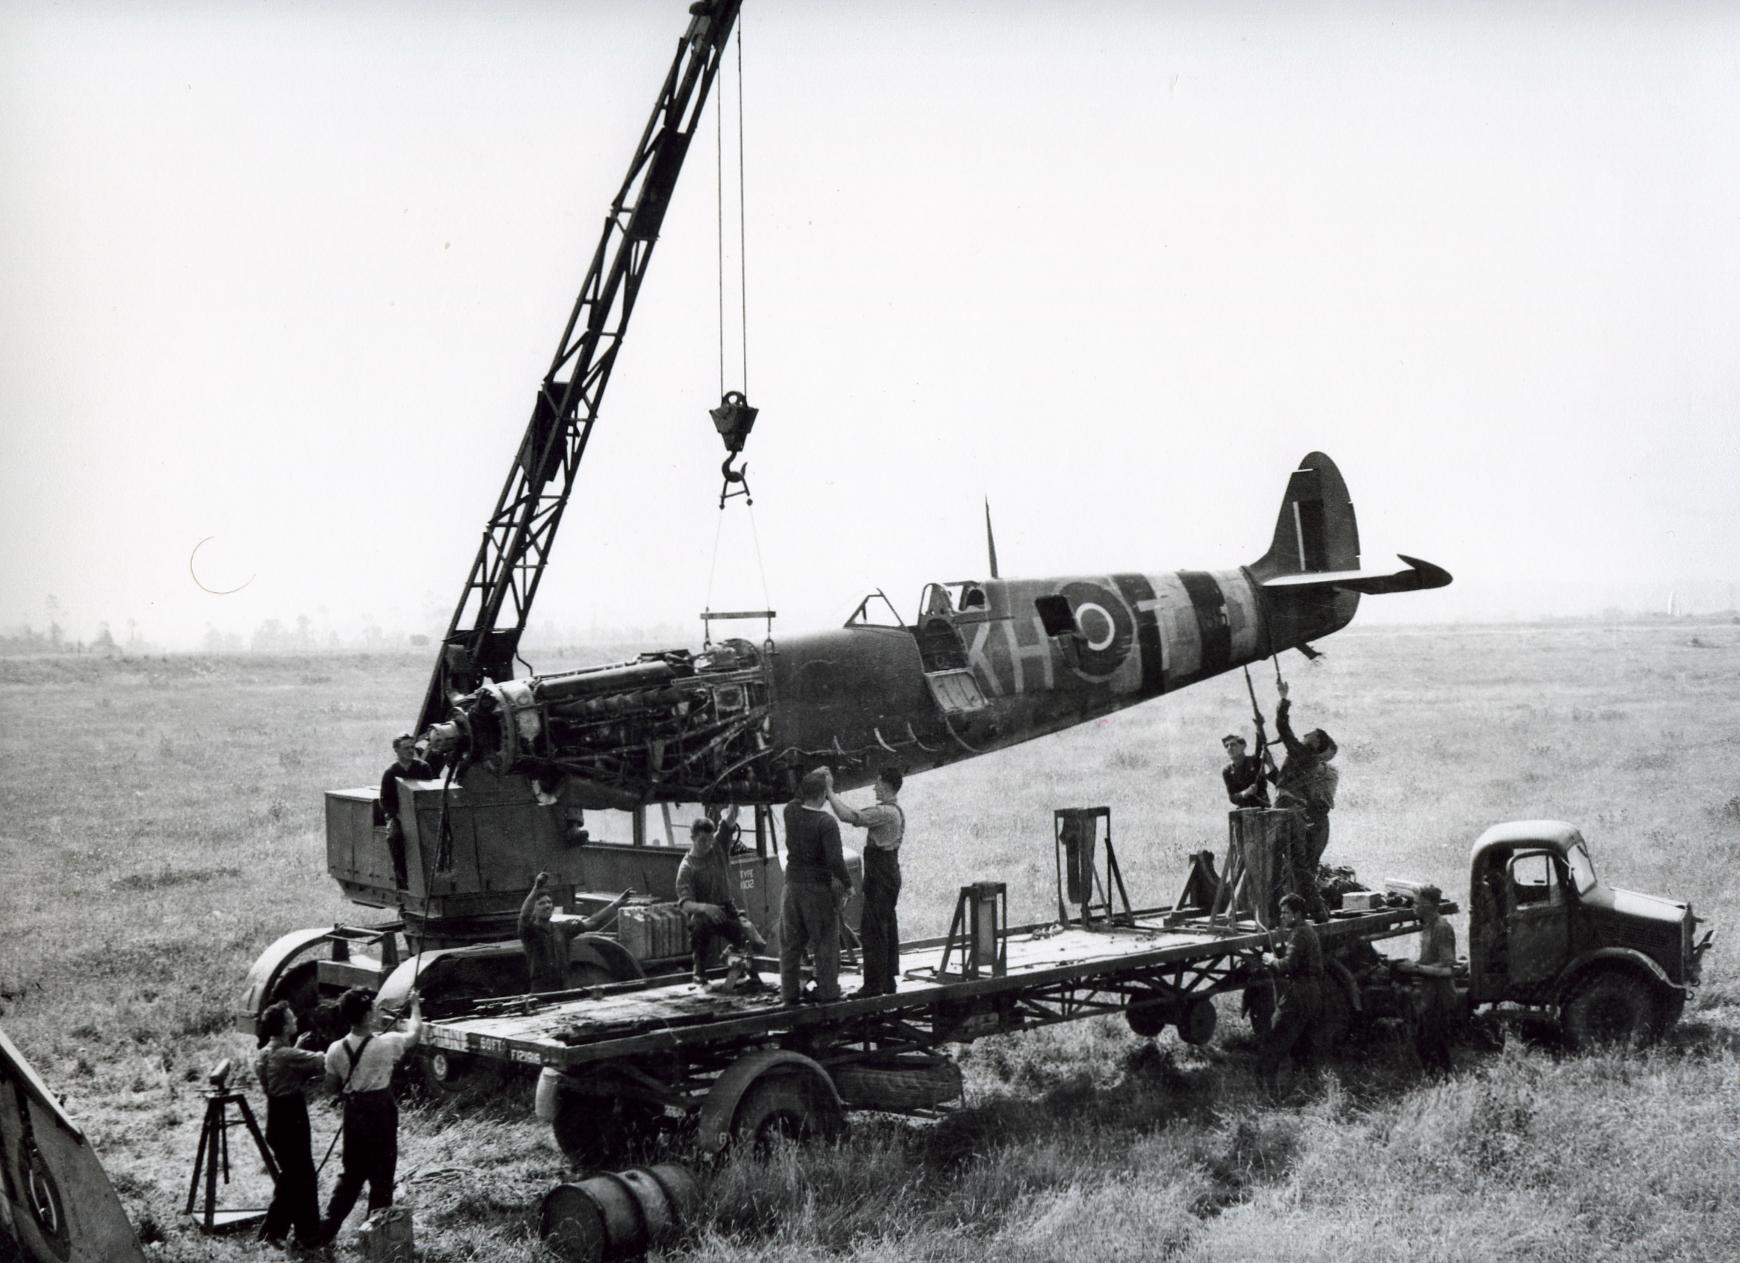 wwii-spitfire-wreck-077.jpg